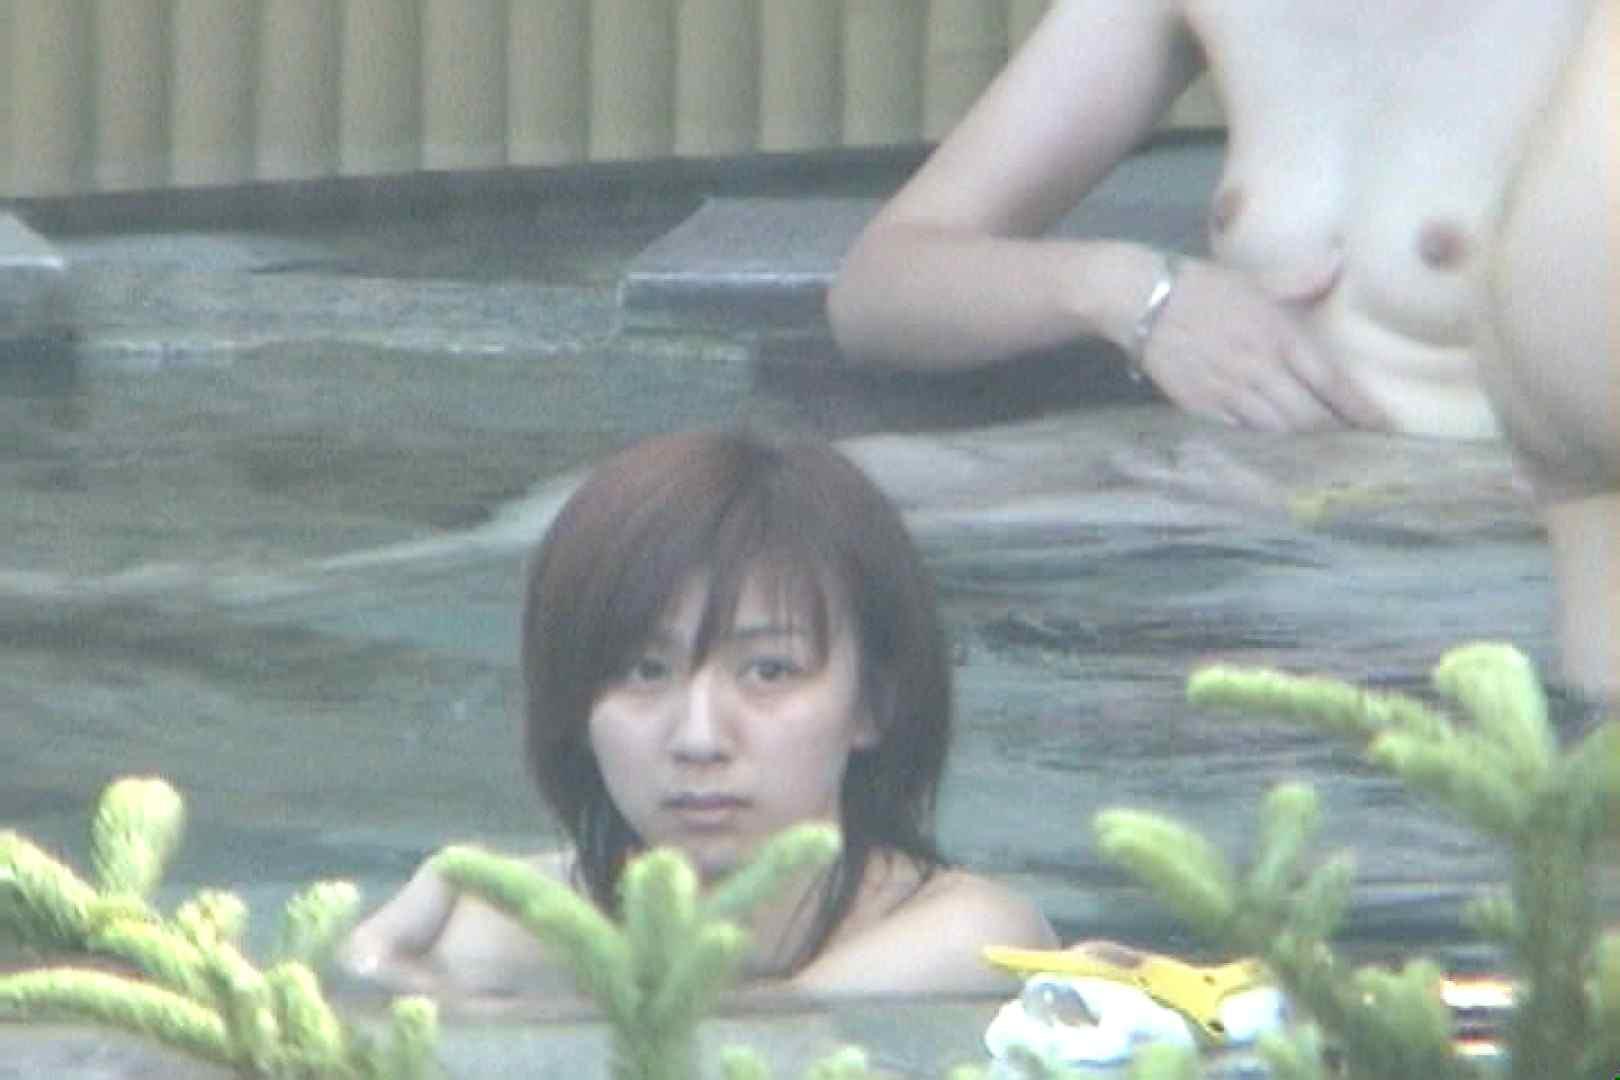 Aquaな露天風呂Vol.77【VIP限定】 露天風呂編  100PIX 80